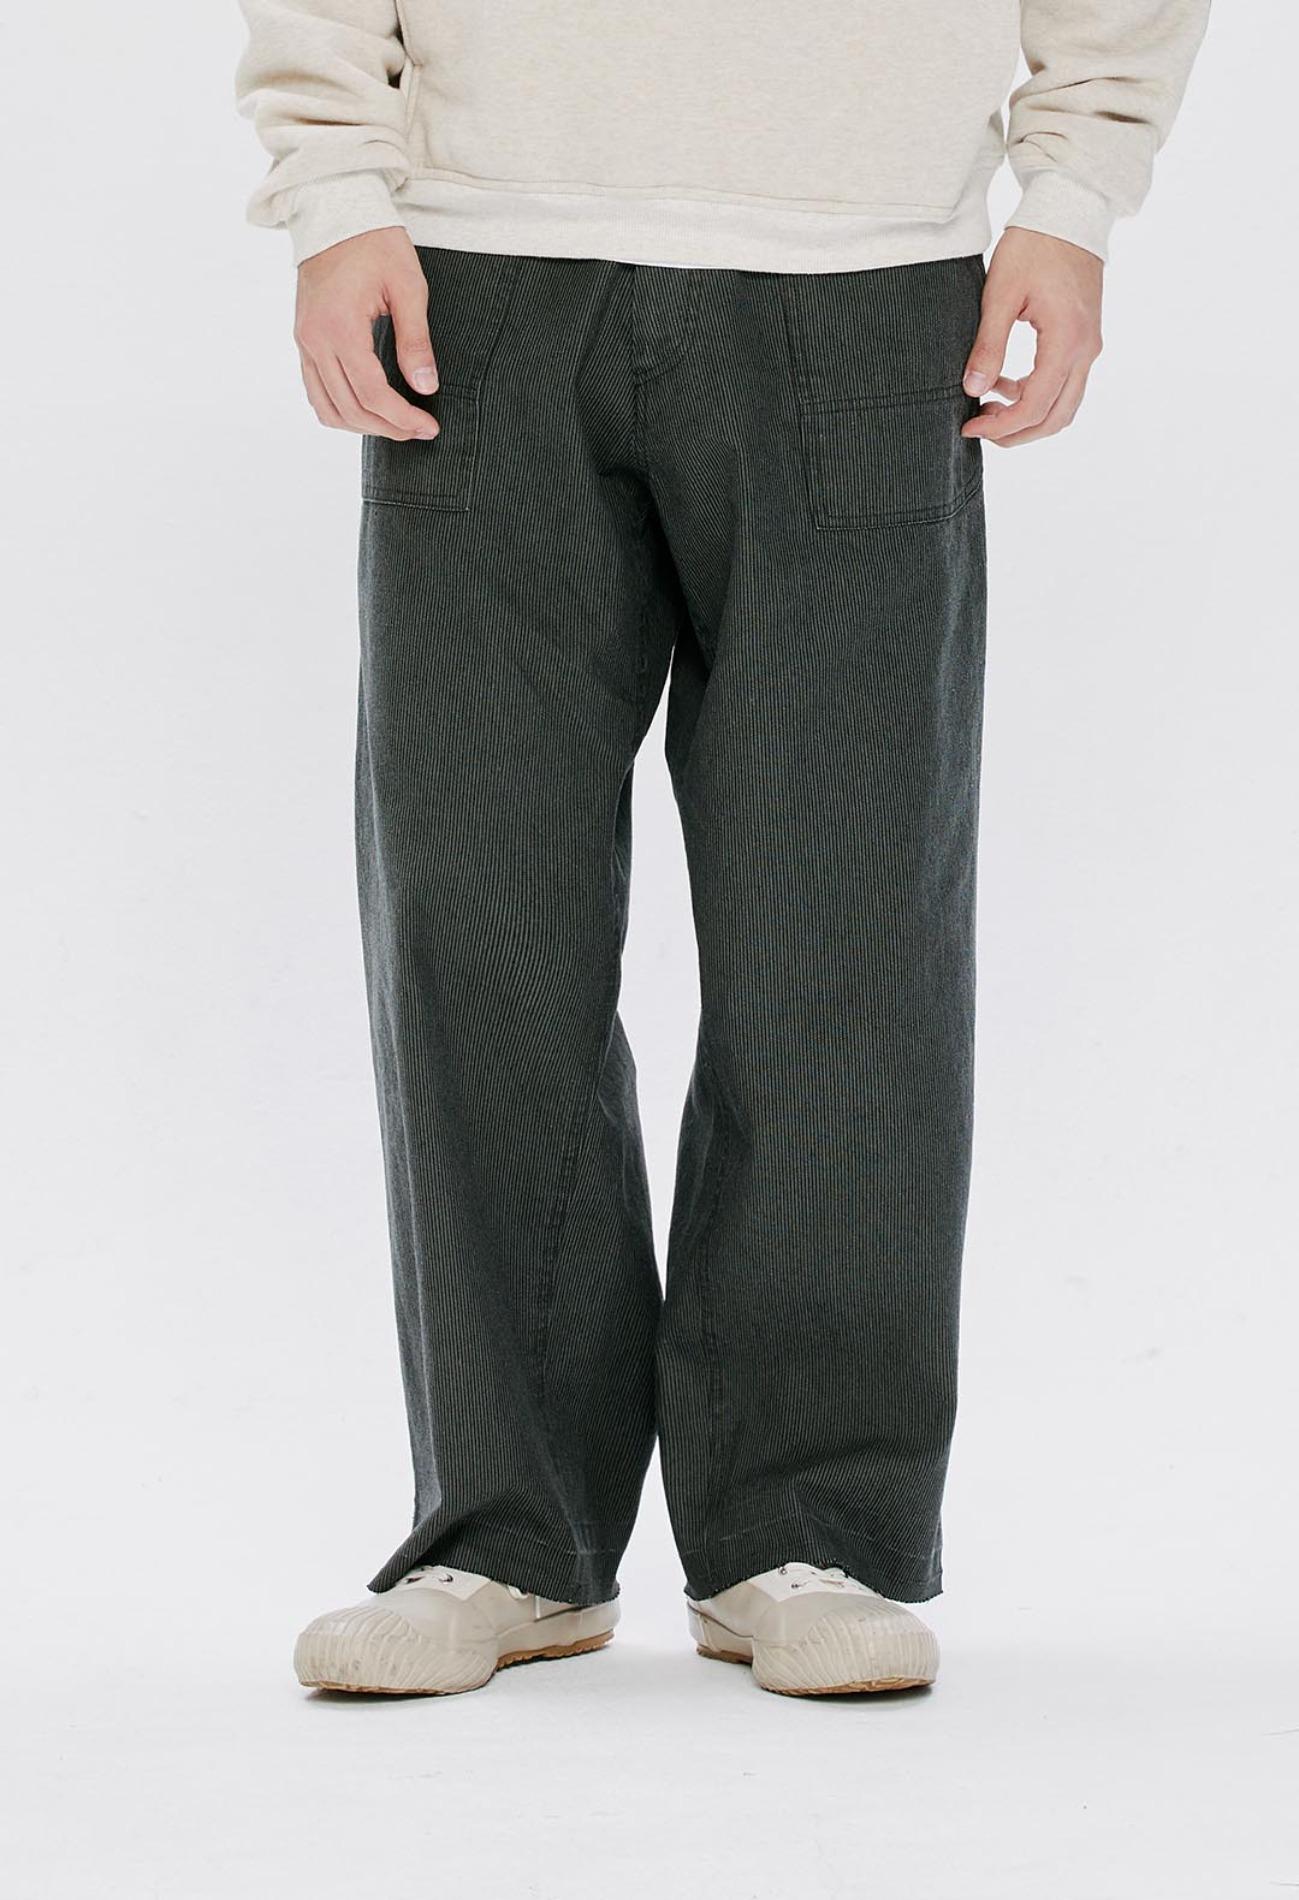 keek Wide Cargo Cotton Pants - khaki 스트릿패션 유니섹스브랜드 커플시밀러룩 남자쇼핑몰 여성의류쇼핑몰 후드티 힙색